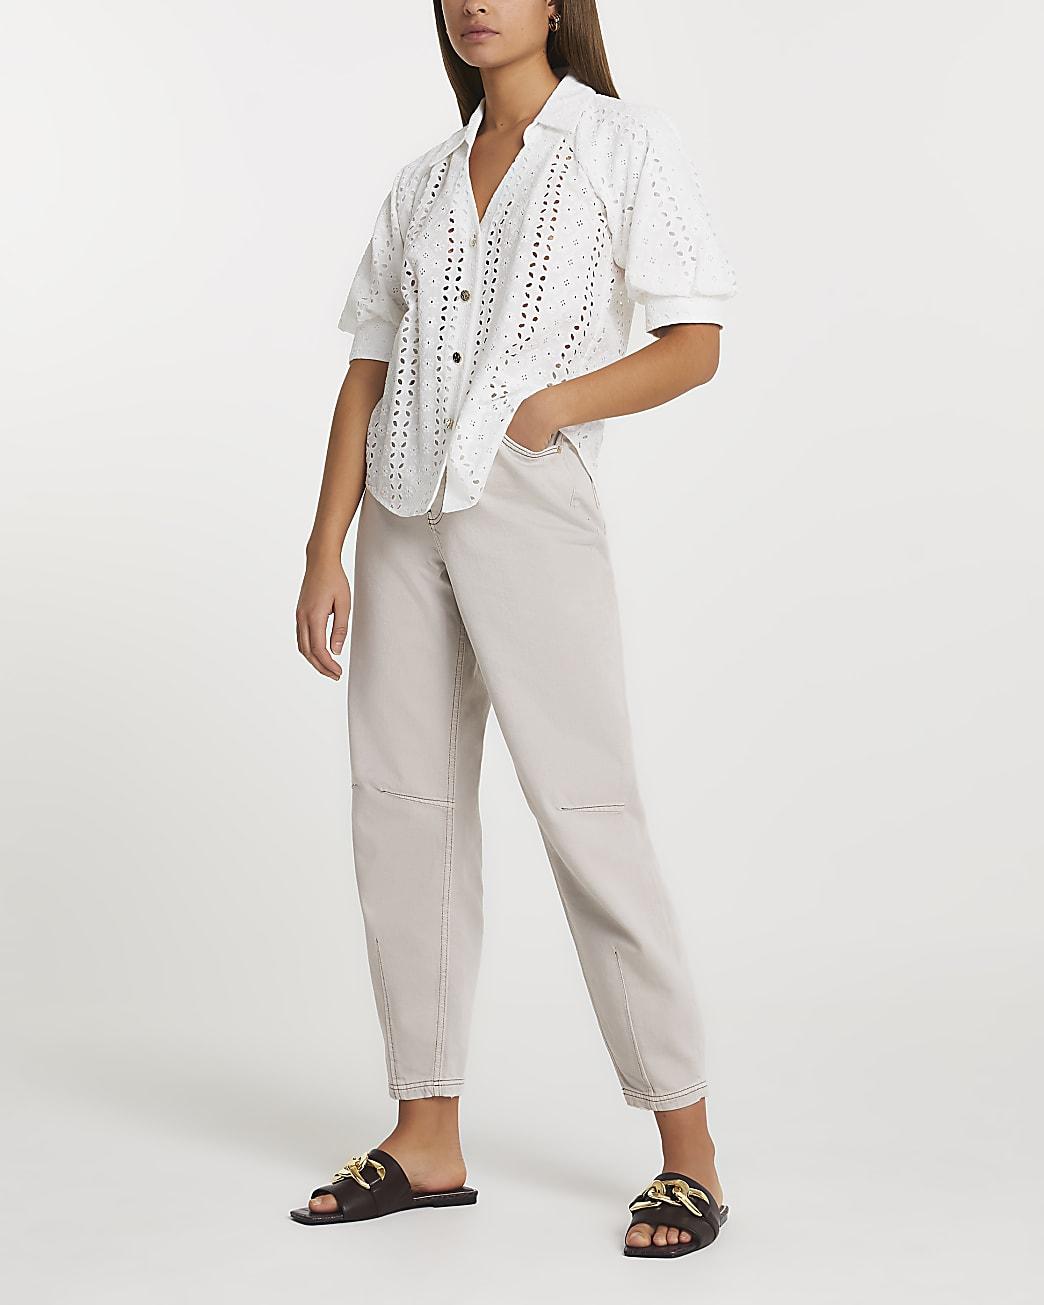 White broderie button down shirt